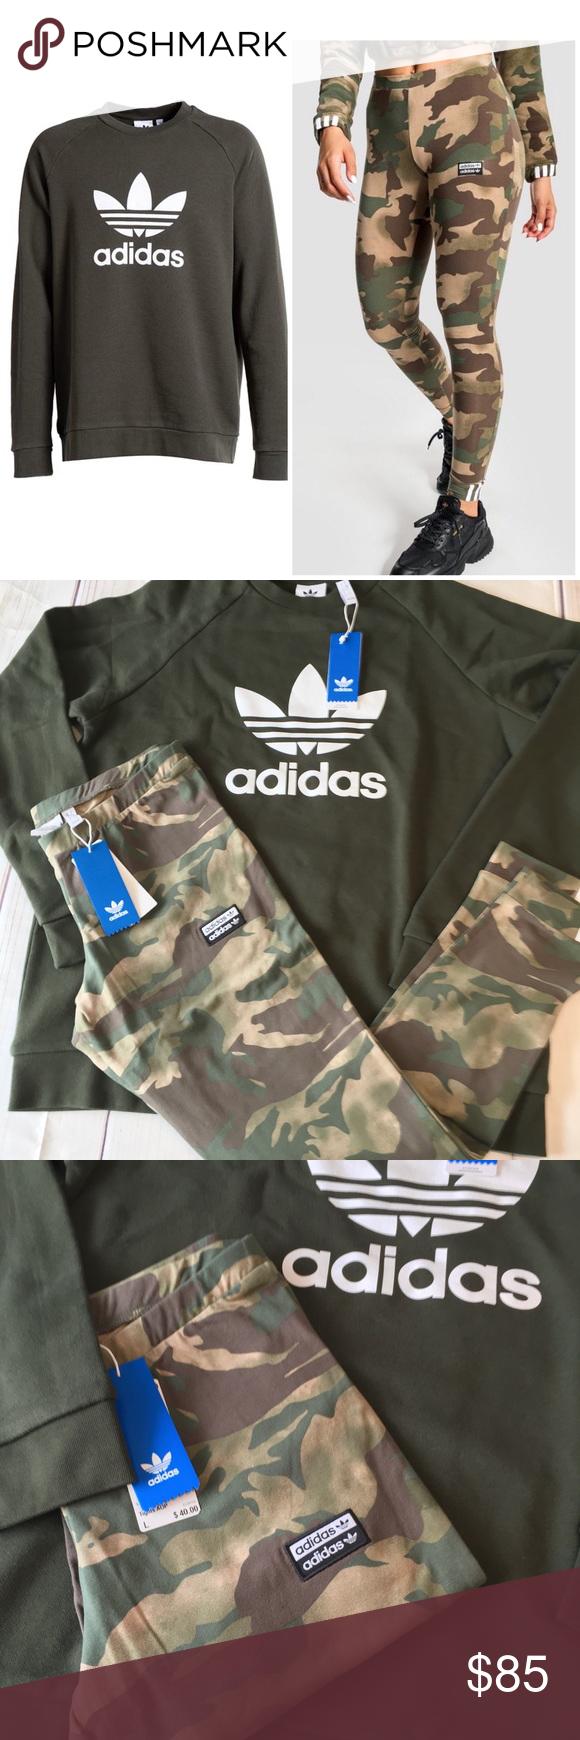 Predownload: New Sweatshirt Leggings Adidas Originals Outfit New Adidas Originals Camo Outfit Camoflage Adidas Ori Adidas Originals Outfit Camo Outfits Adidas Originals [ 1740 x 580 Pixel ]